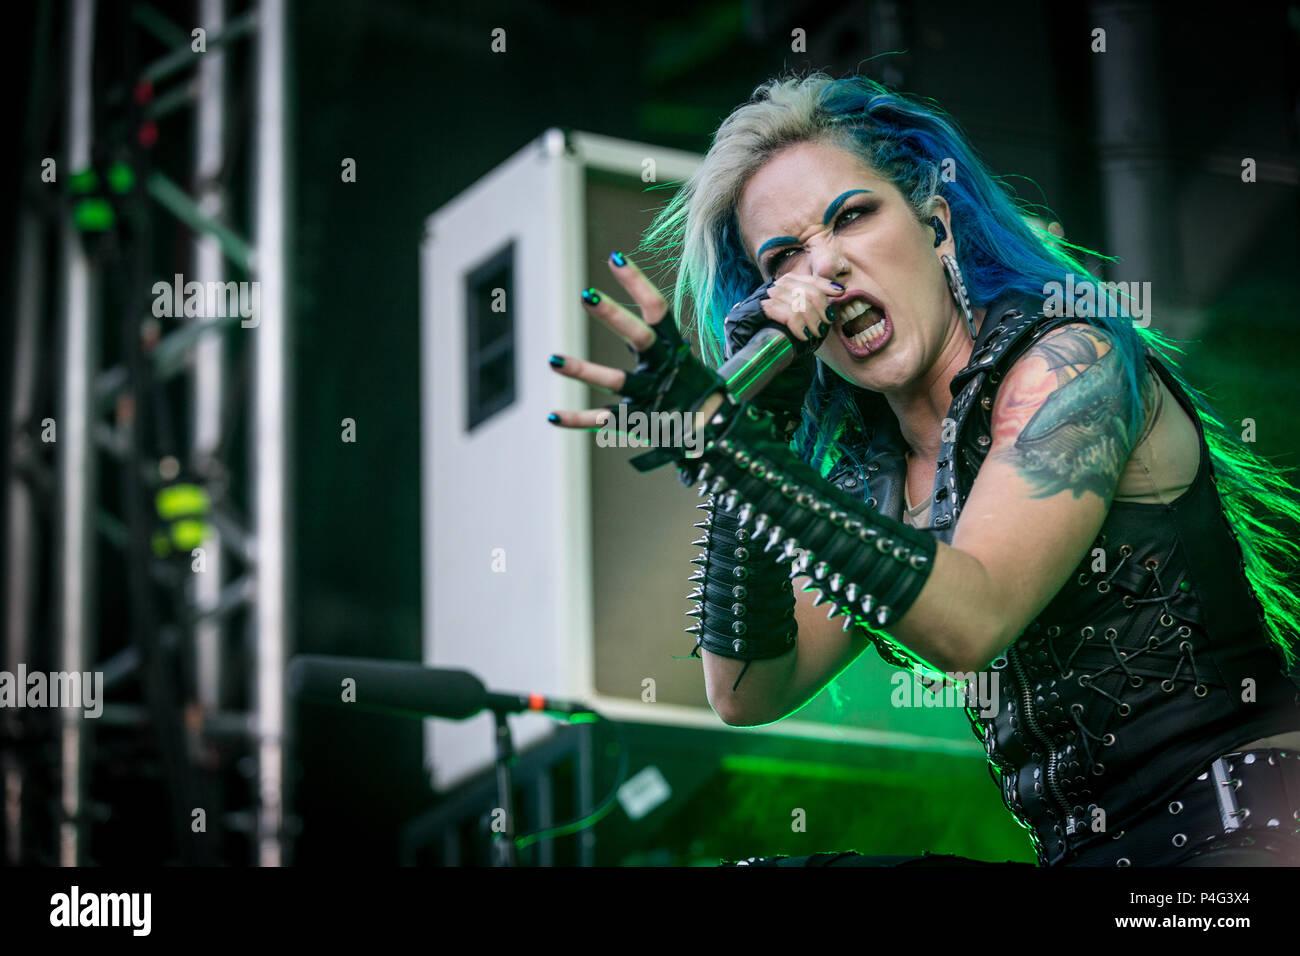 Copenhagen Denmark 21 June 2018 The Swedish Melodic Death Metal Band Arch Enemy Performs A Live Concert During The Danish Heavy Metal Festival Copenhell 2018 In Copenhagen Here Vocalist Alissa White Gluz